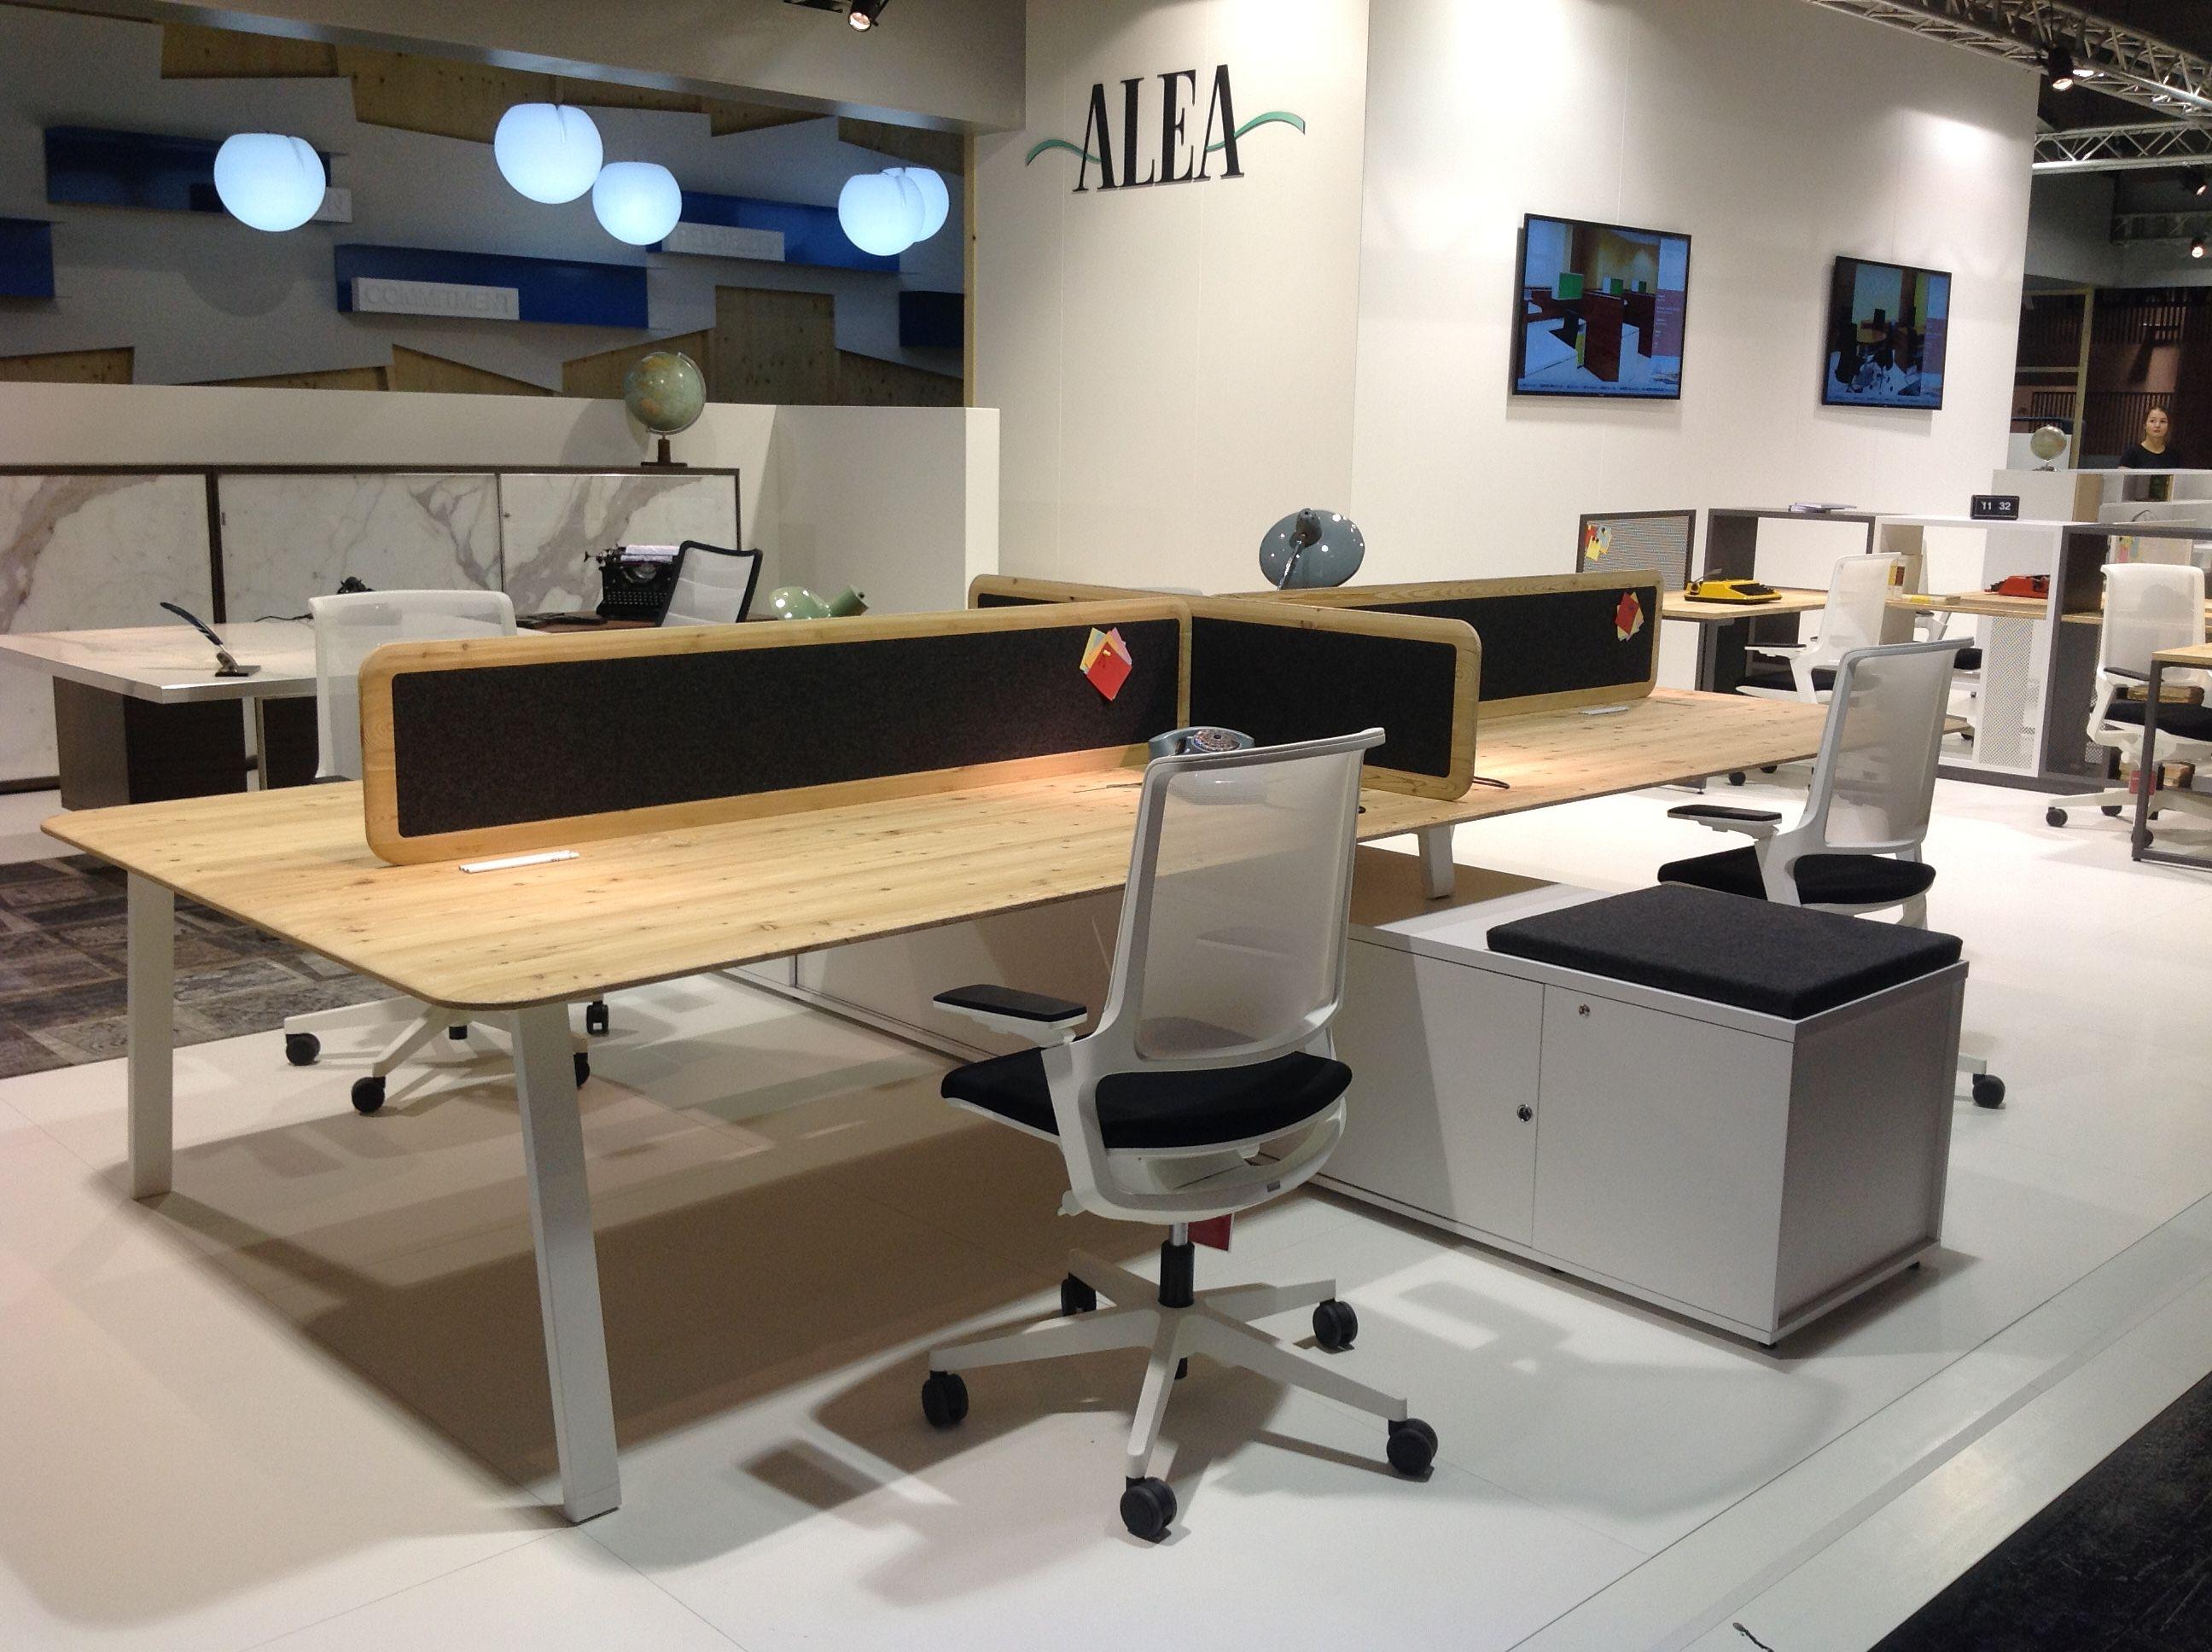 Alea #Furniture #Design #Corporate #Interiors #Workspace #Benching #Desk